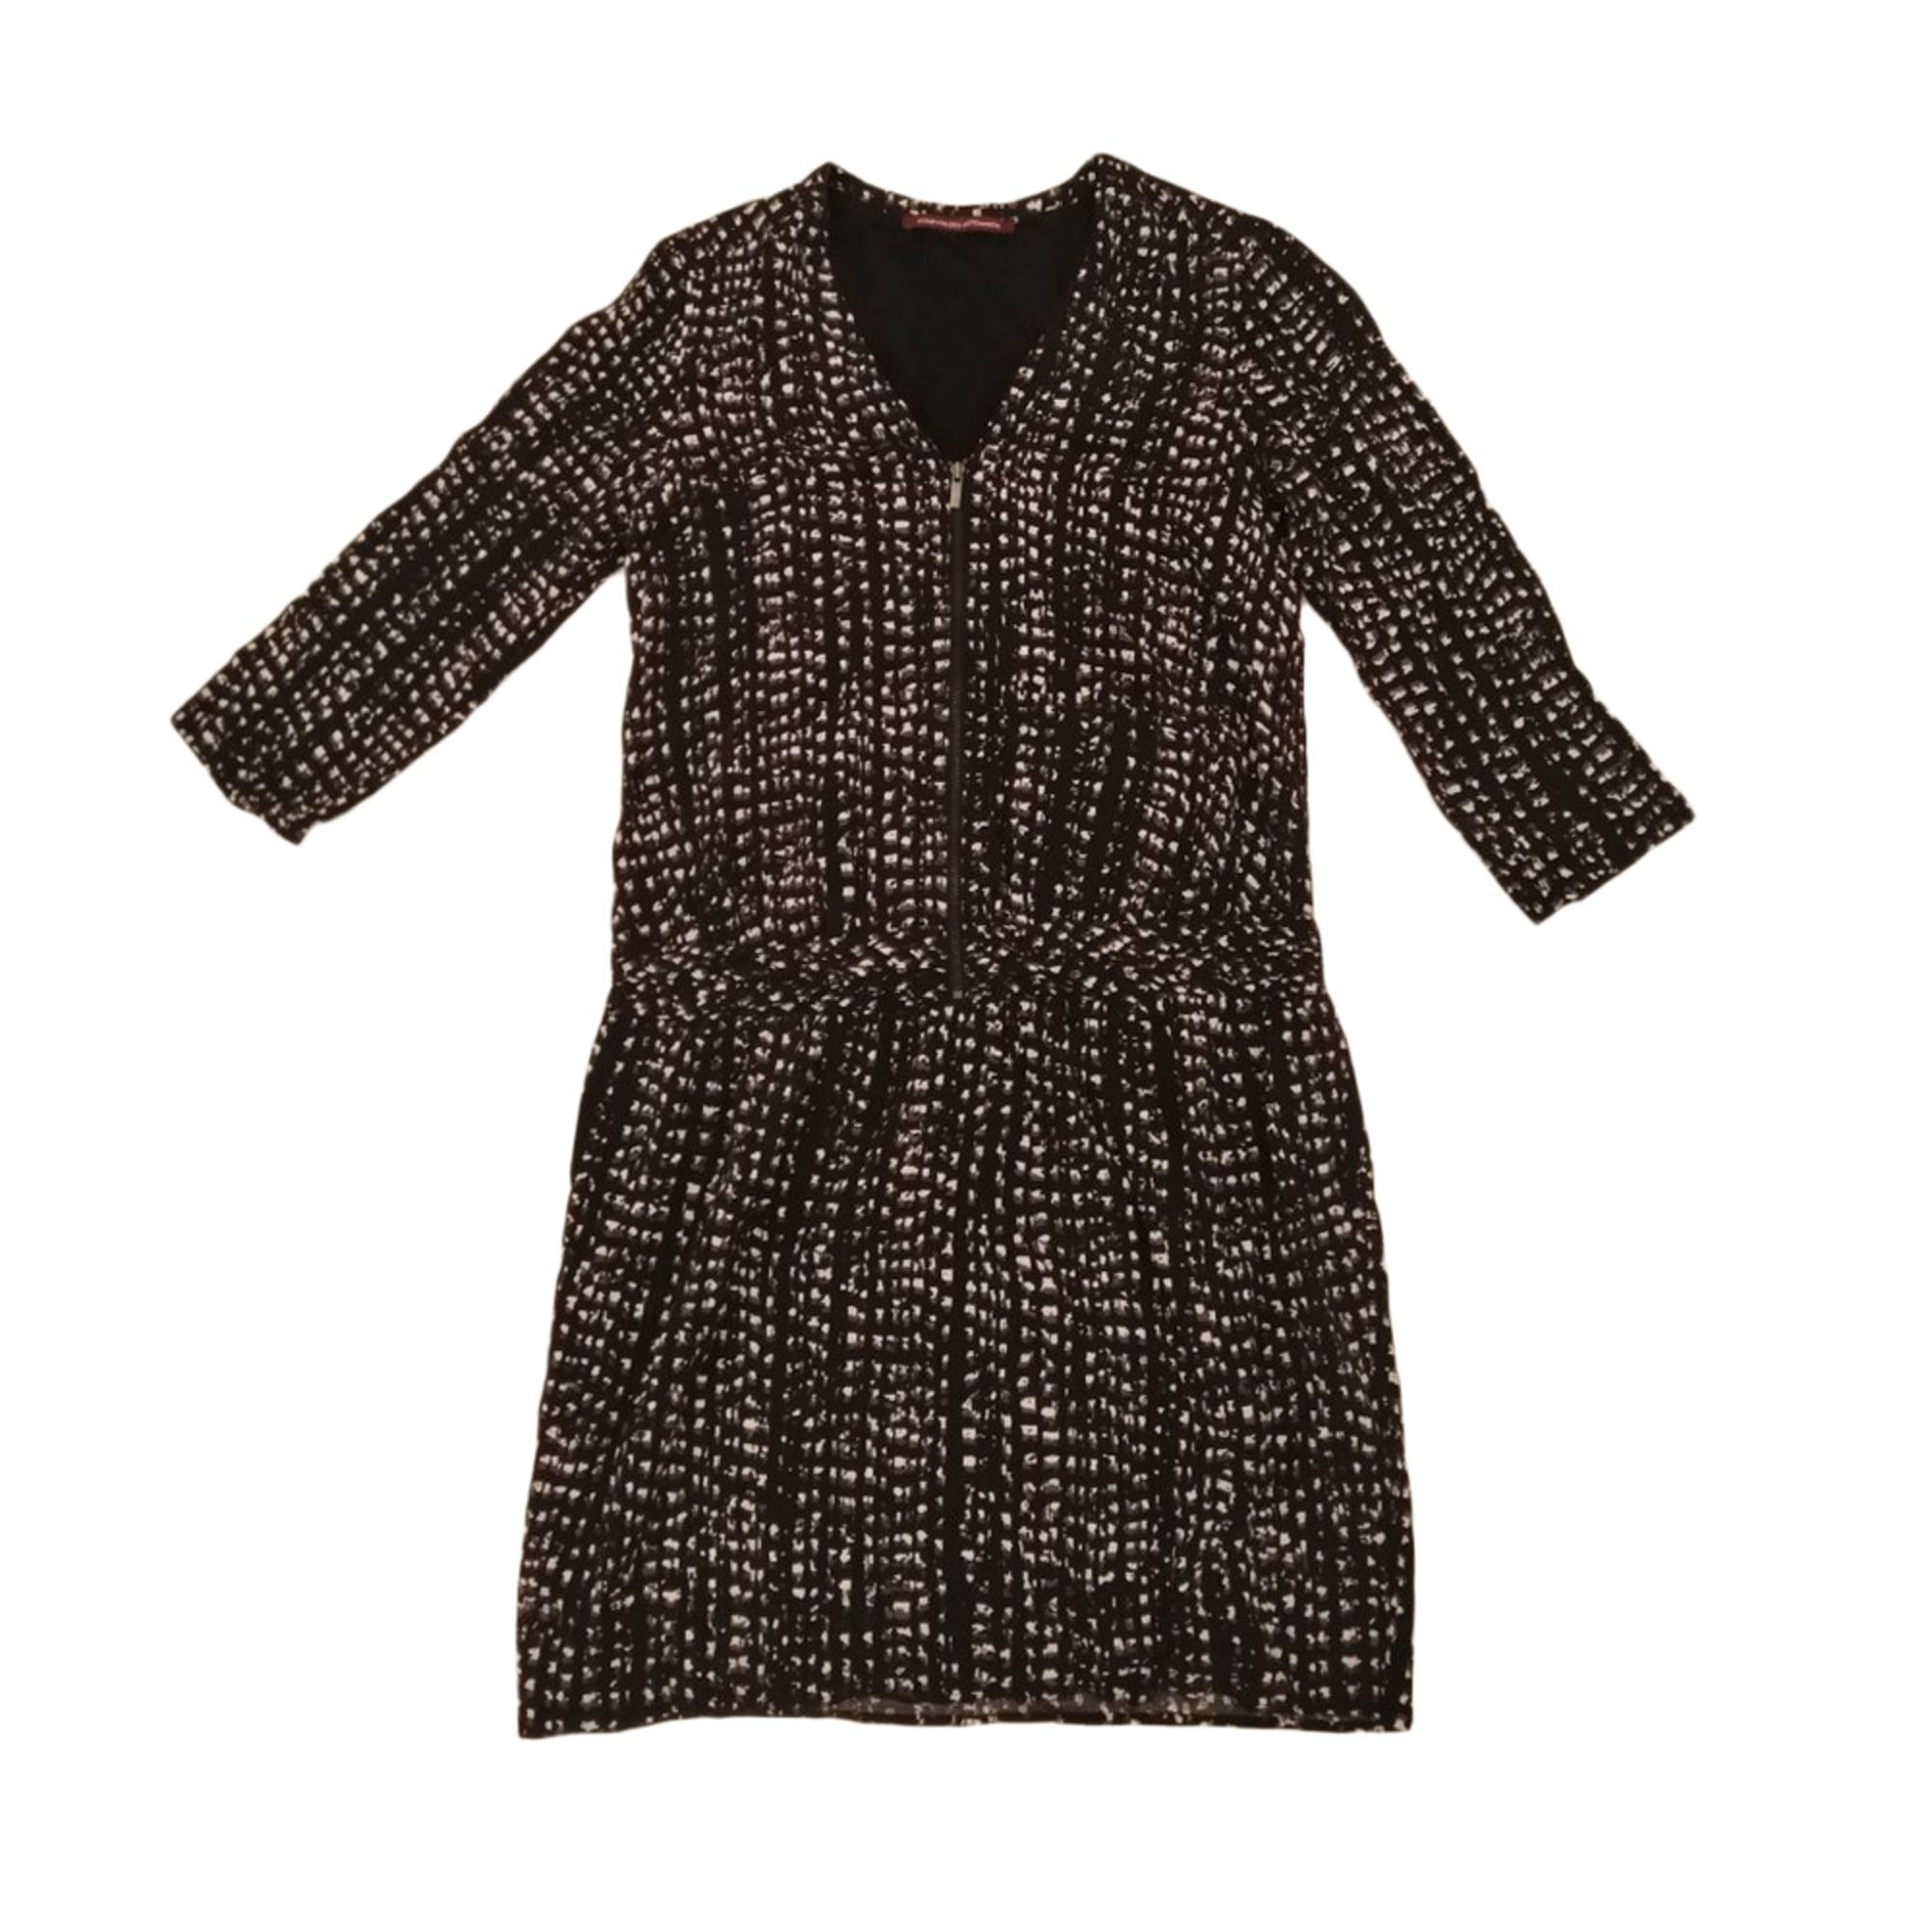 Mini Dress COMPTOIR DES COTONNIERS Black